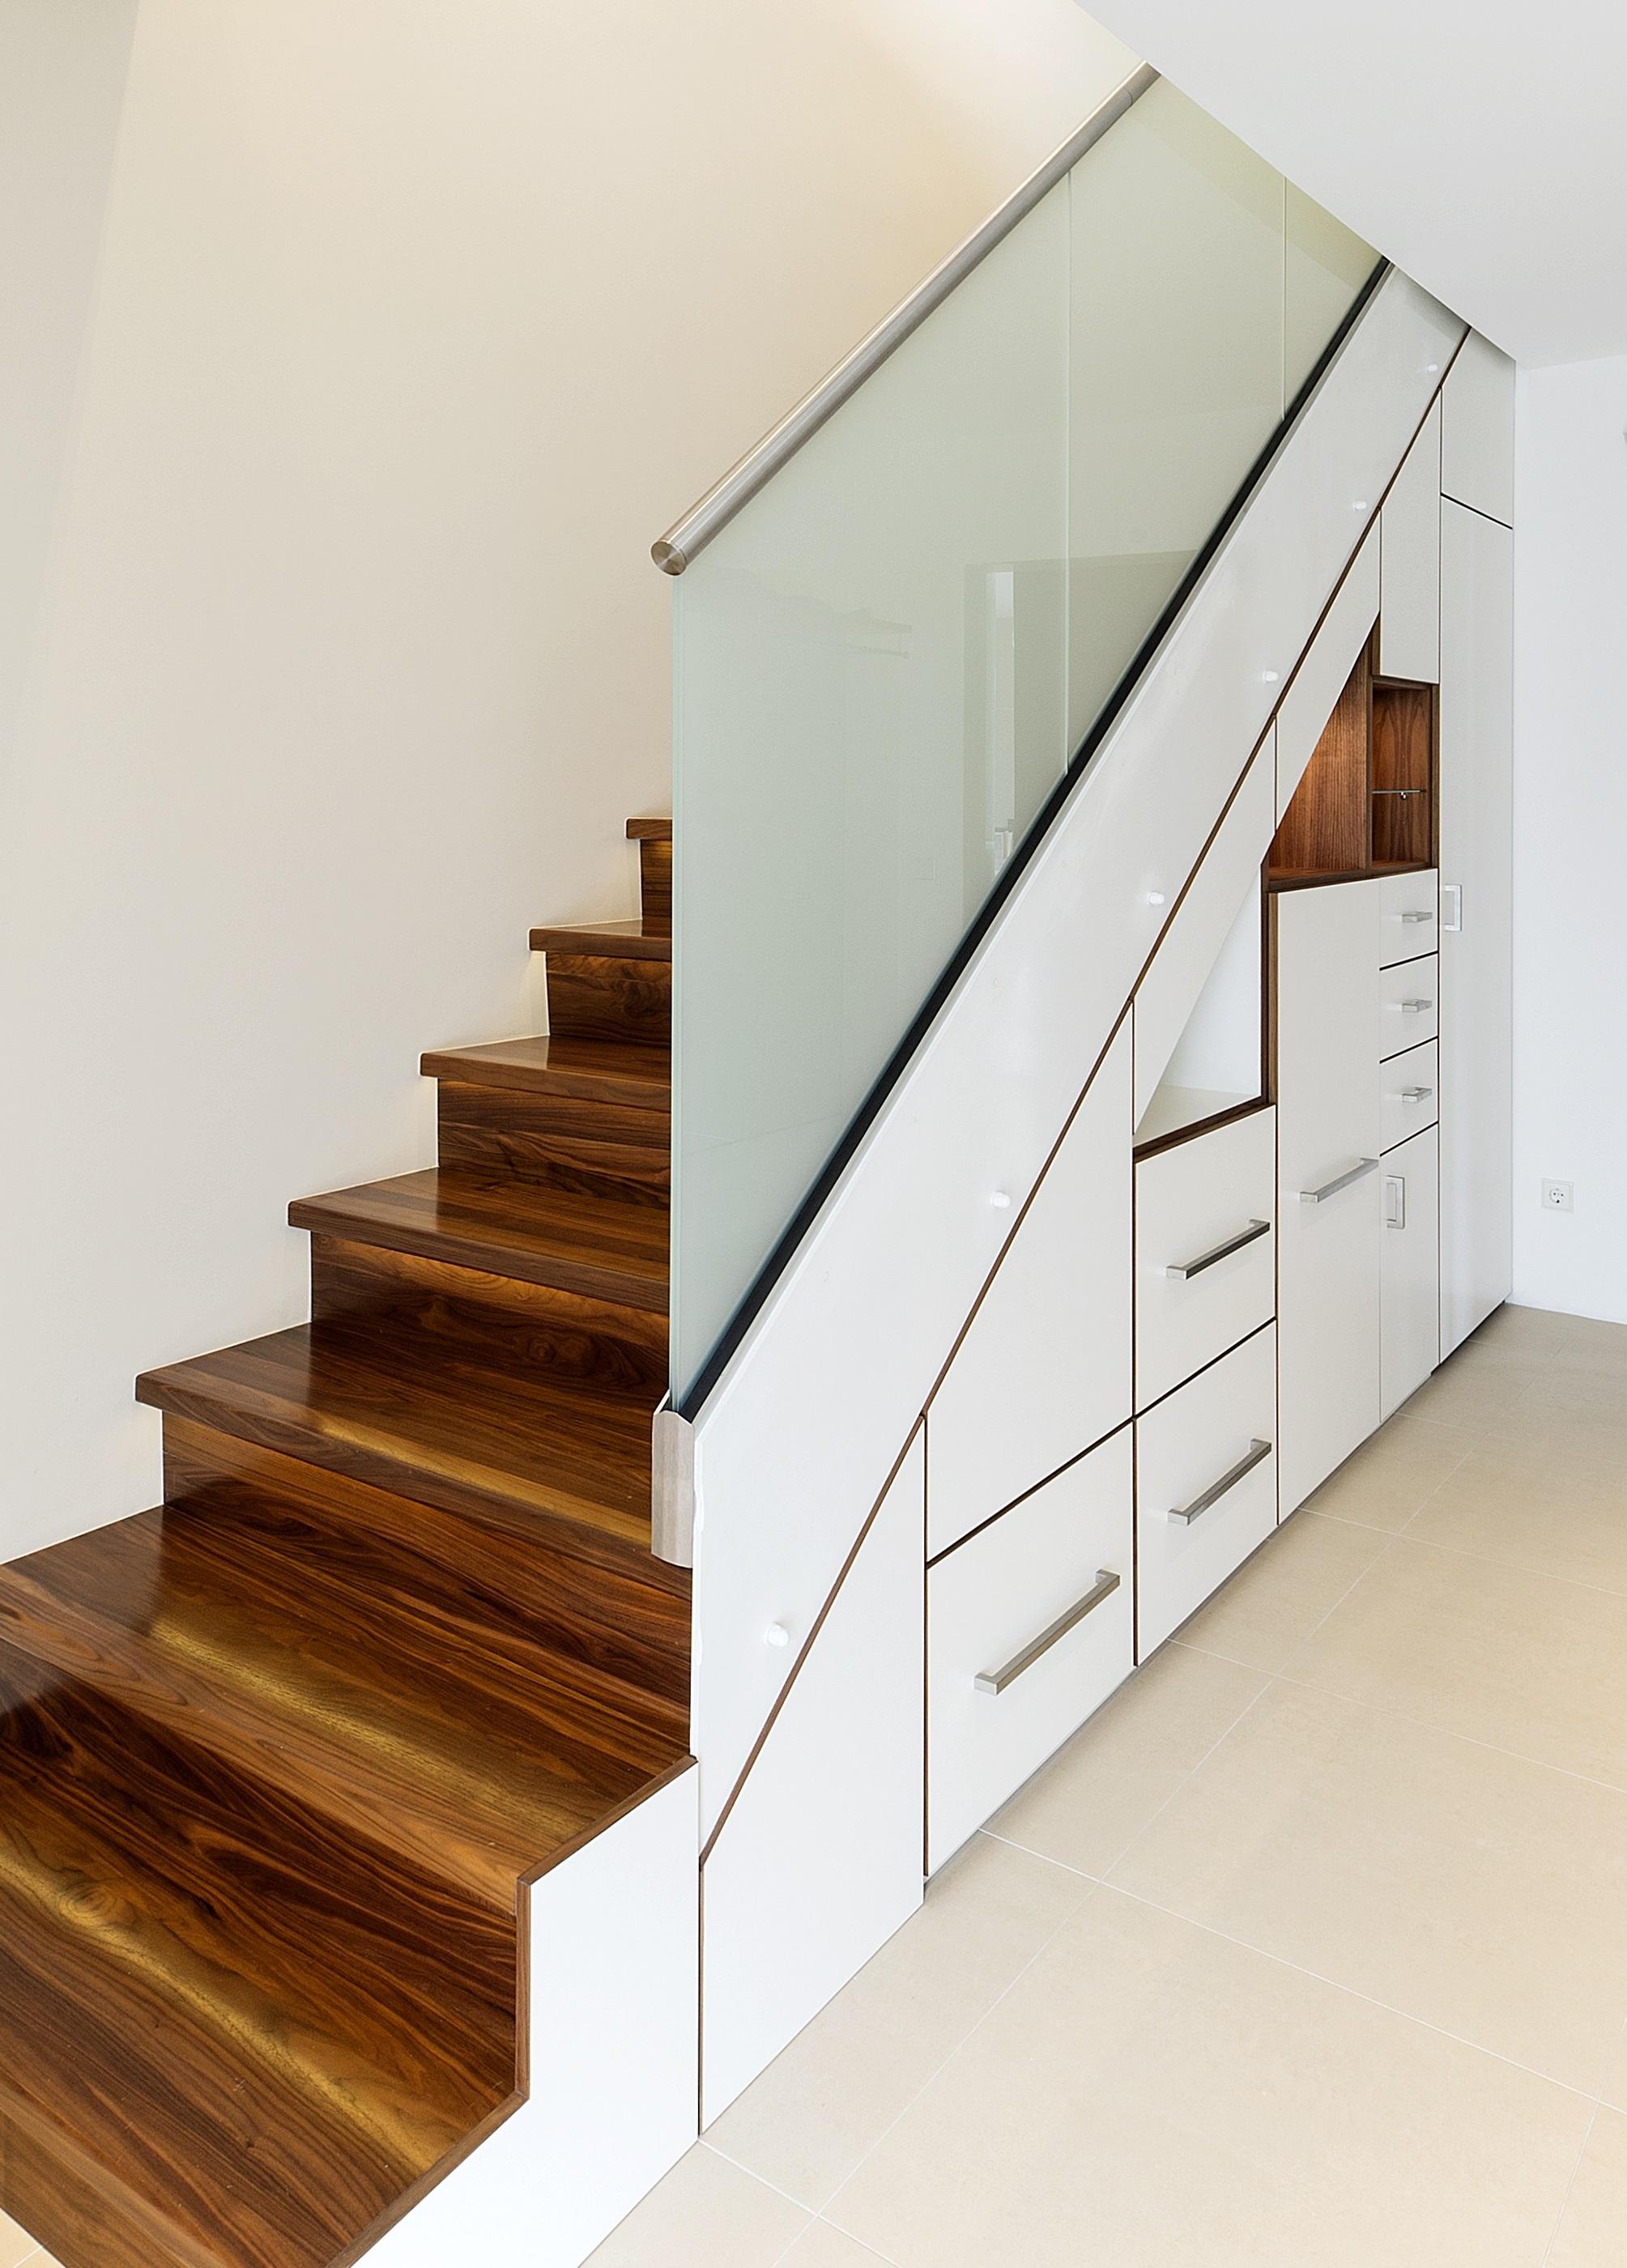 restaurierung leipzig h ring. Black Bedroom Furniture Sets. Home Design Ideas